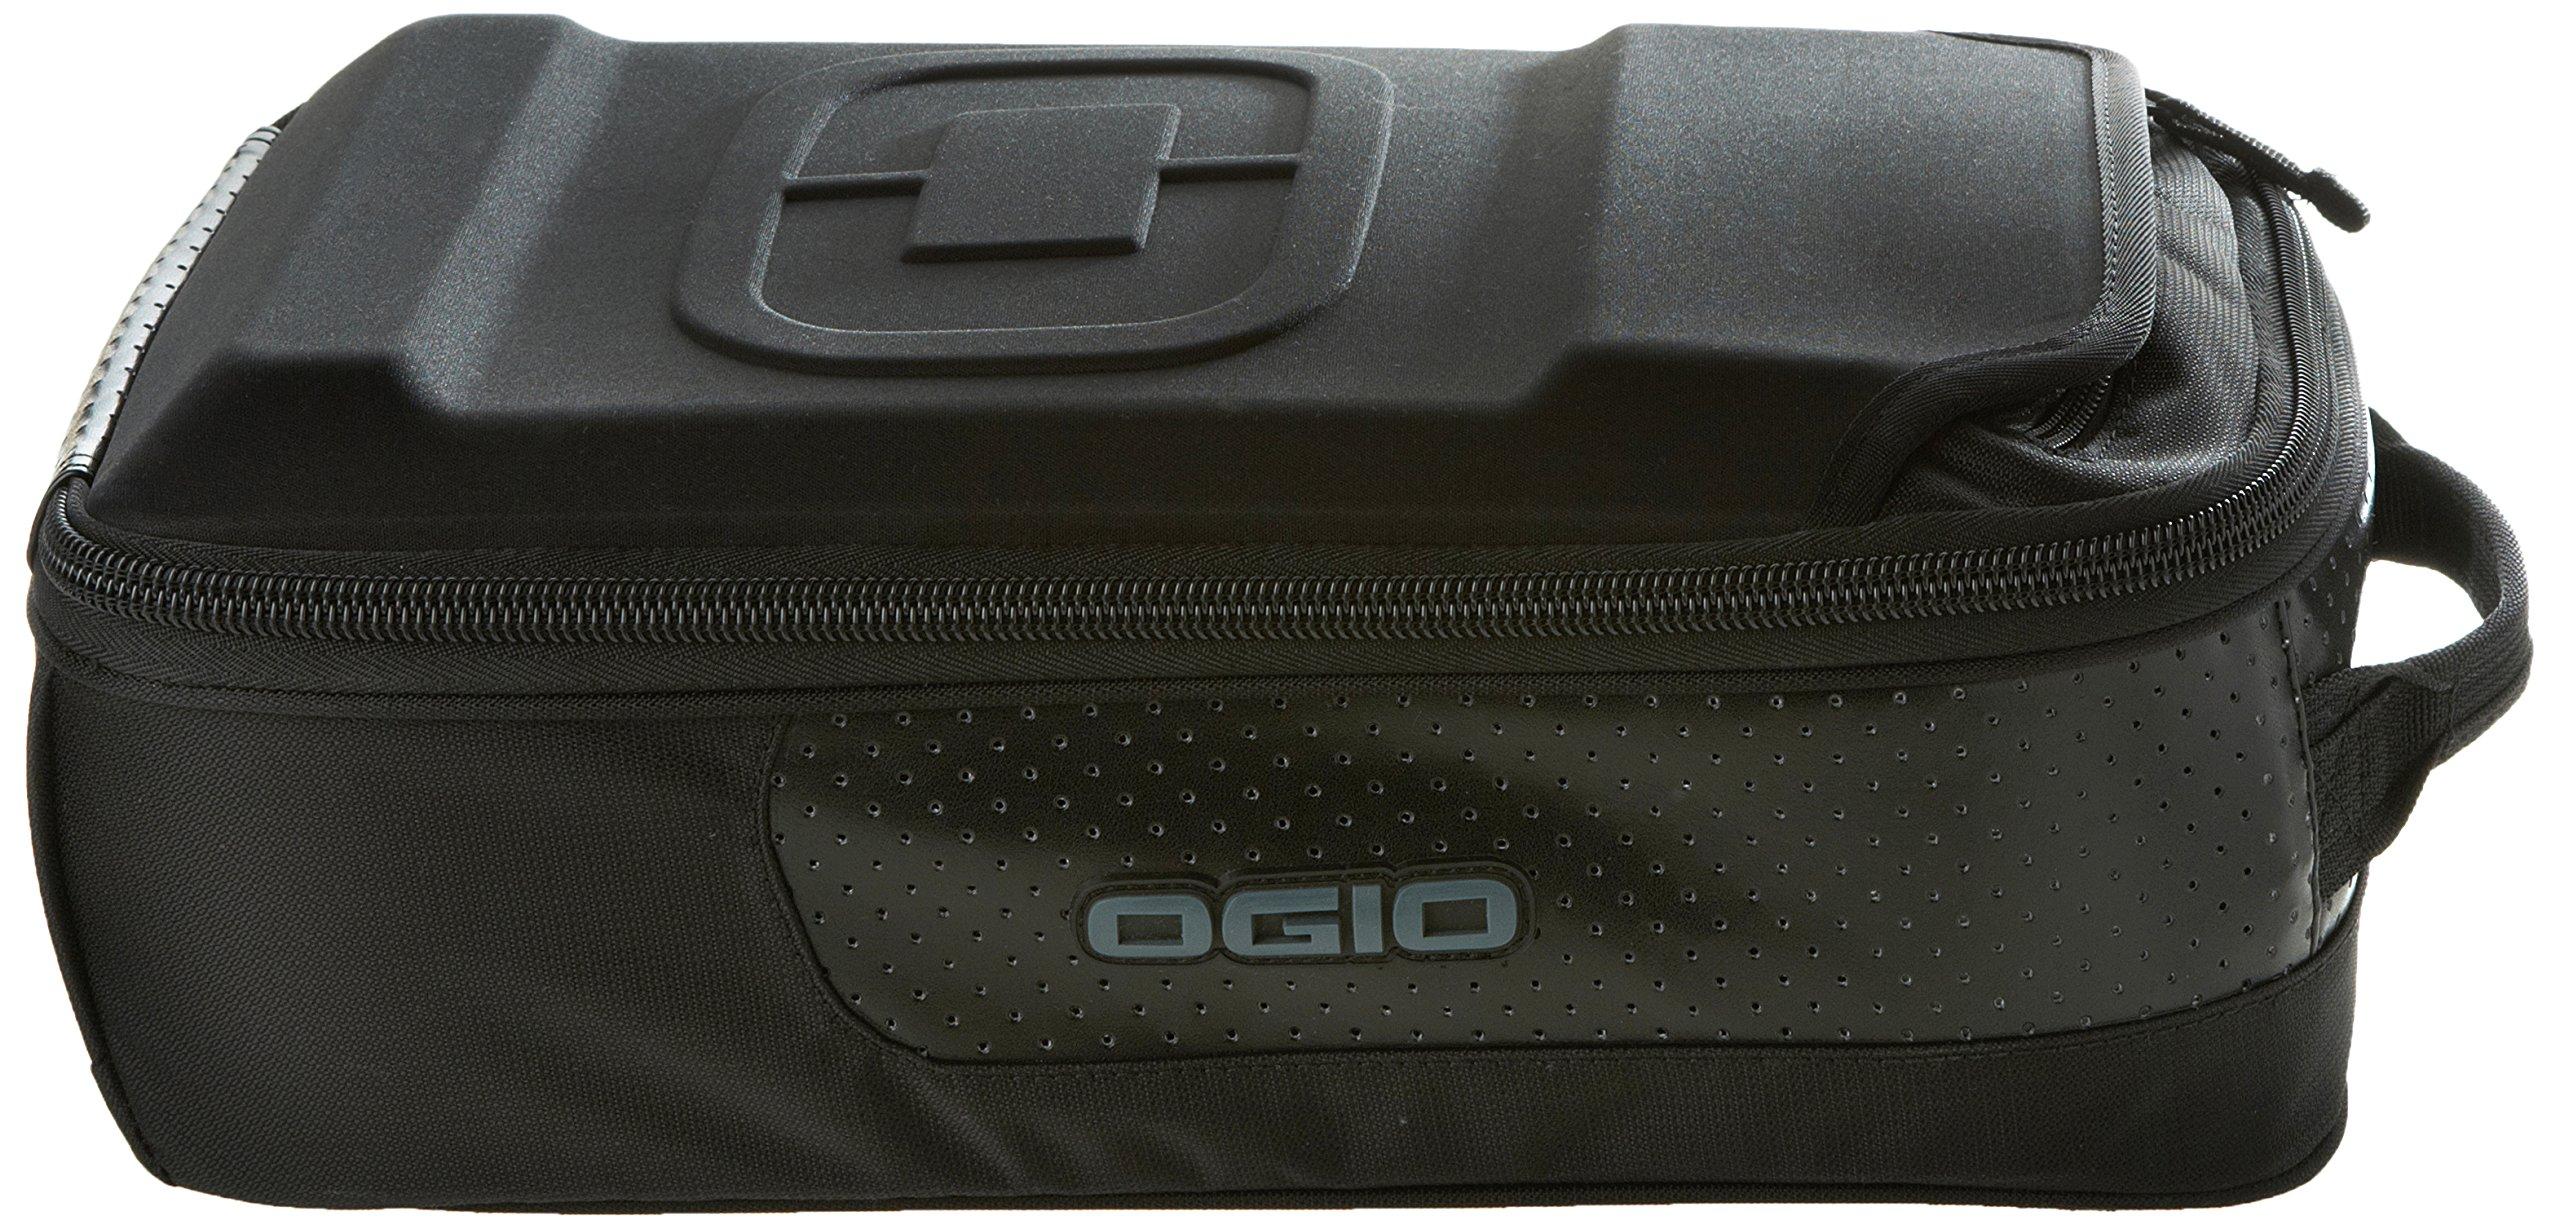 OGIO 109025.36 Stealth Black Google Box